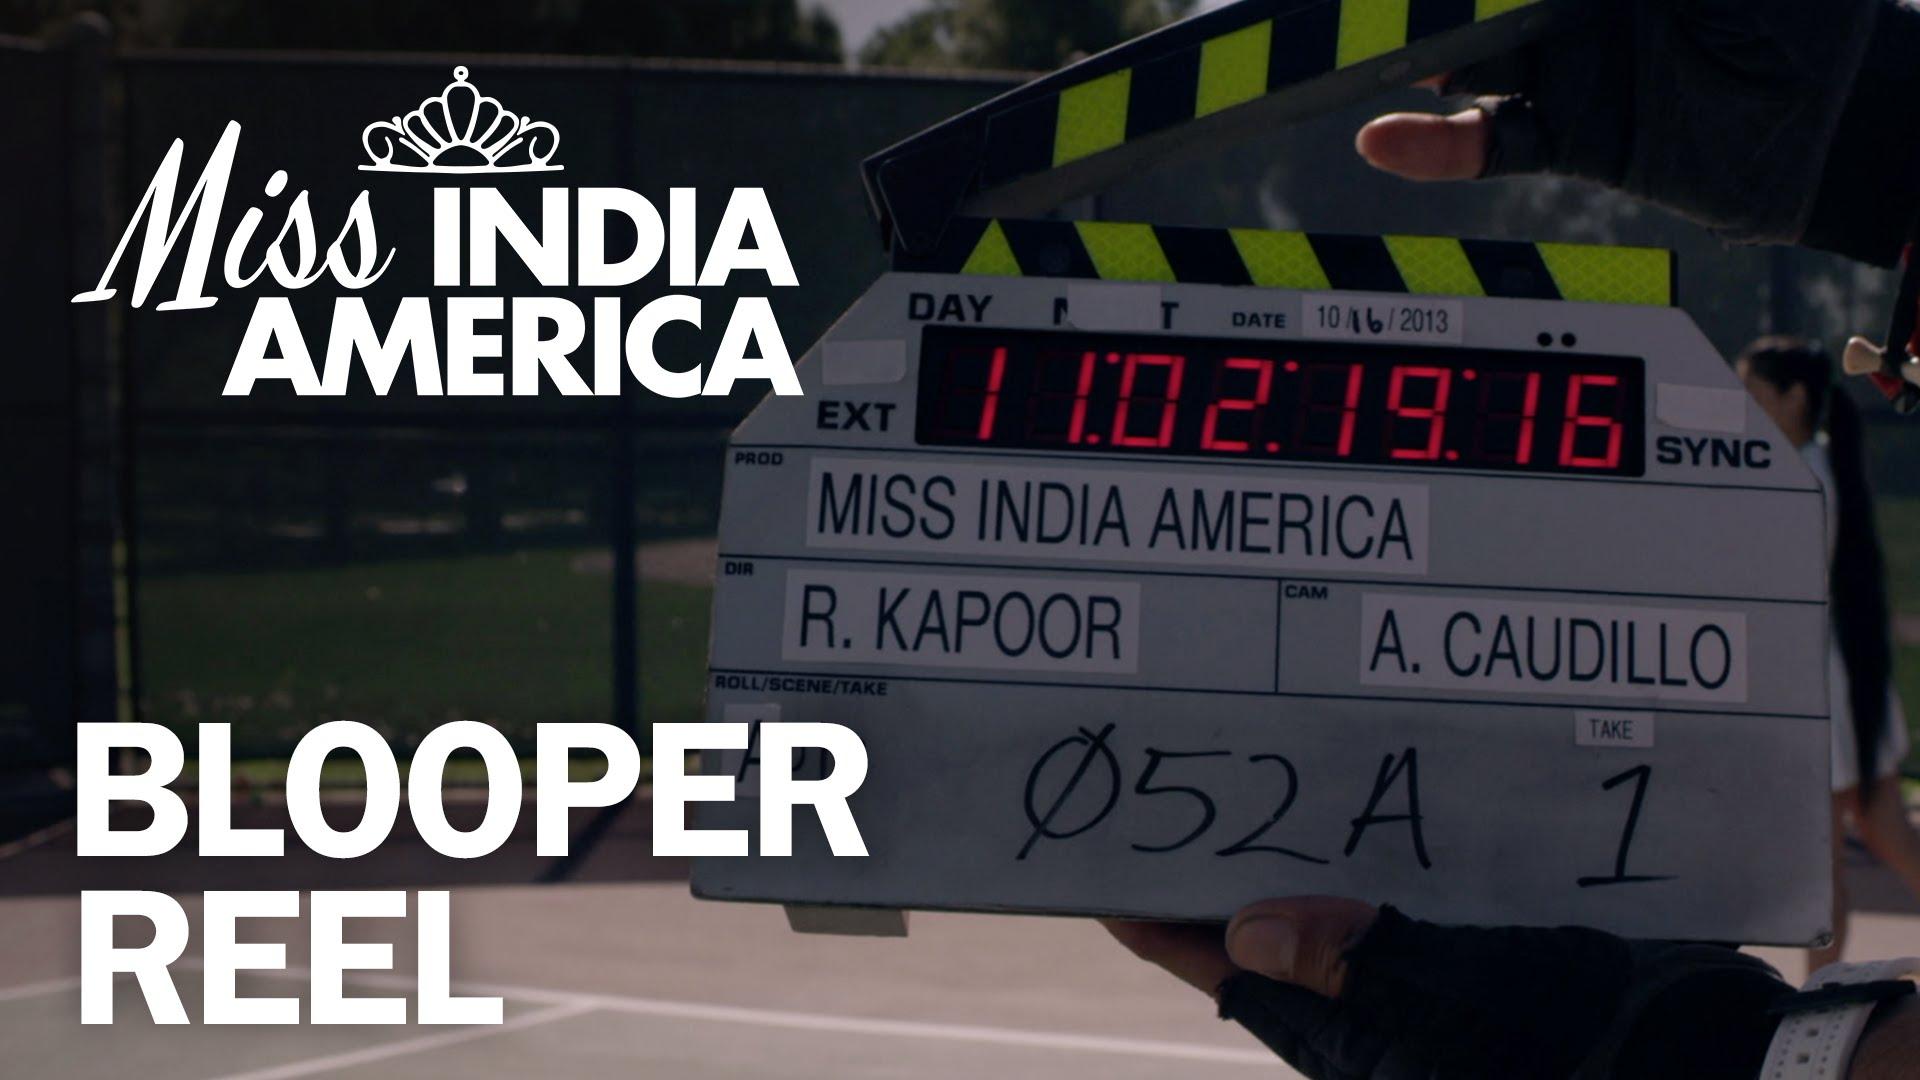 Miss India America - Blooper Reel - MarVista Entertainment